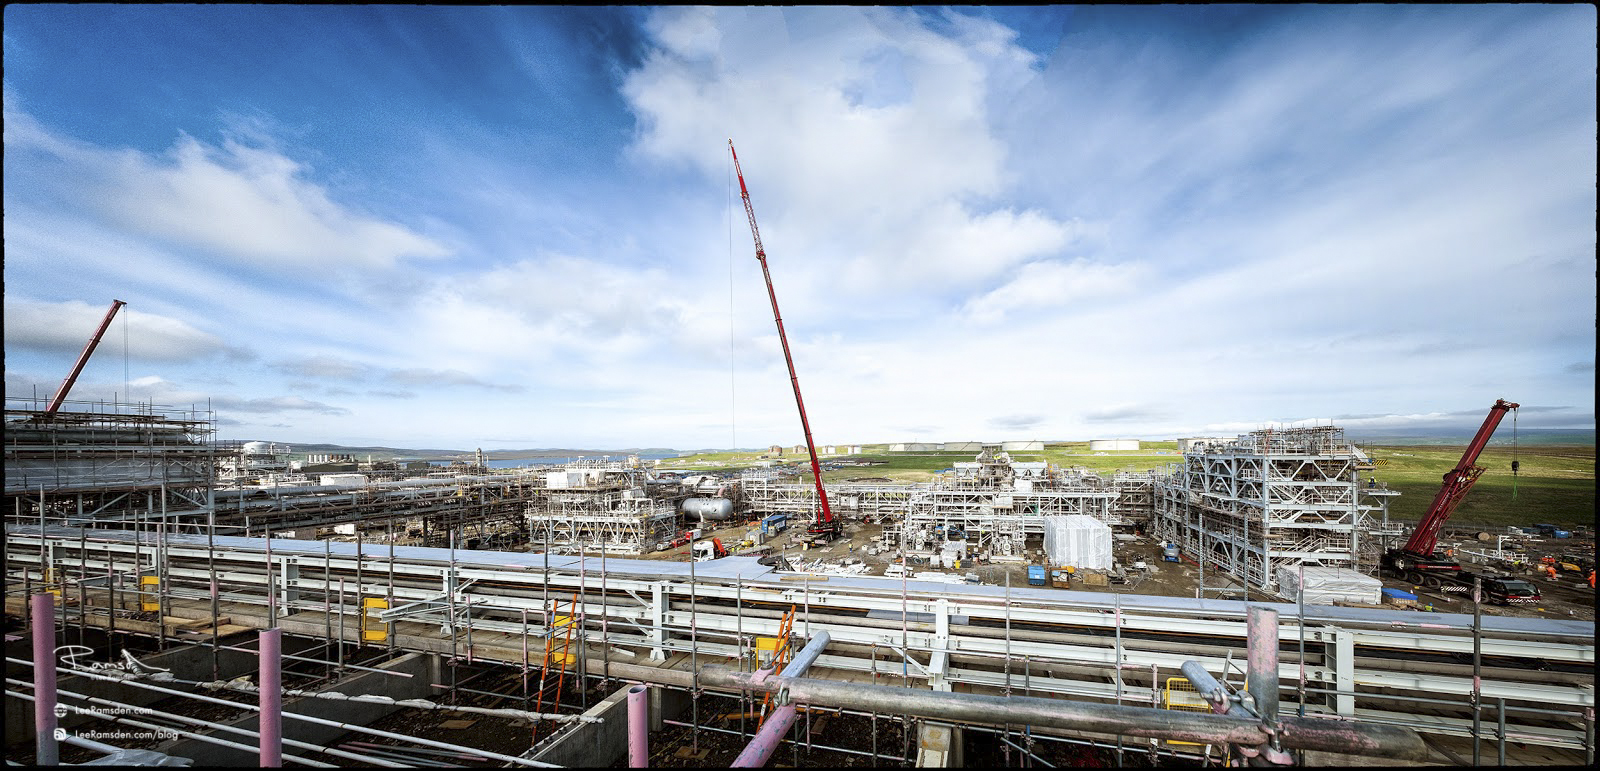 Shetland gas plant BP Sullom Voe Total Petrofac contractor health and safety laggan tormore